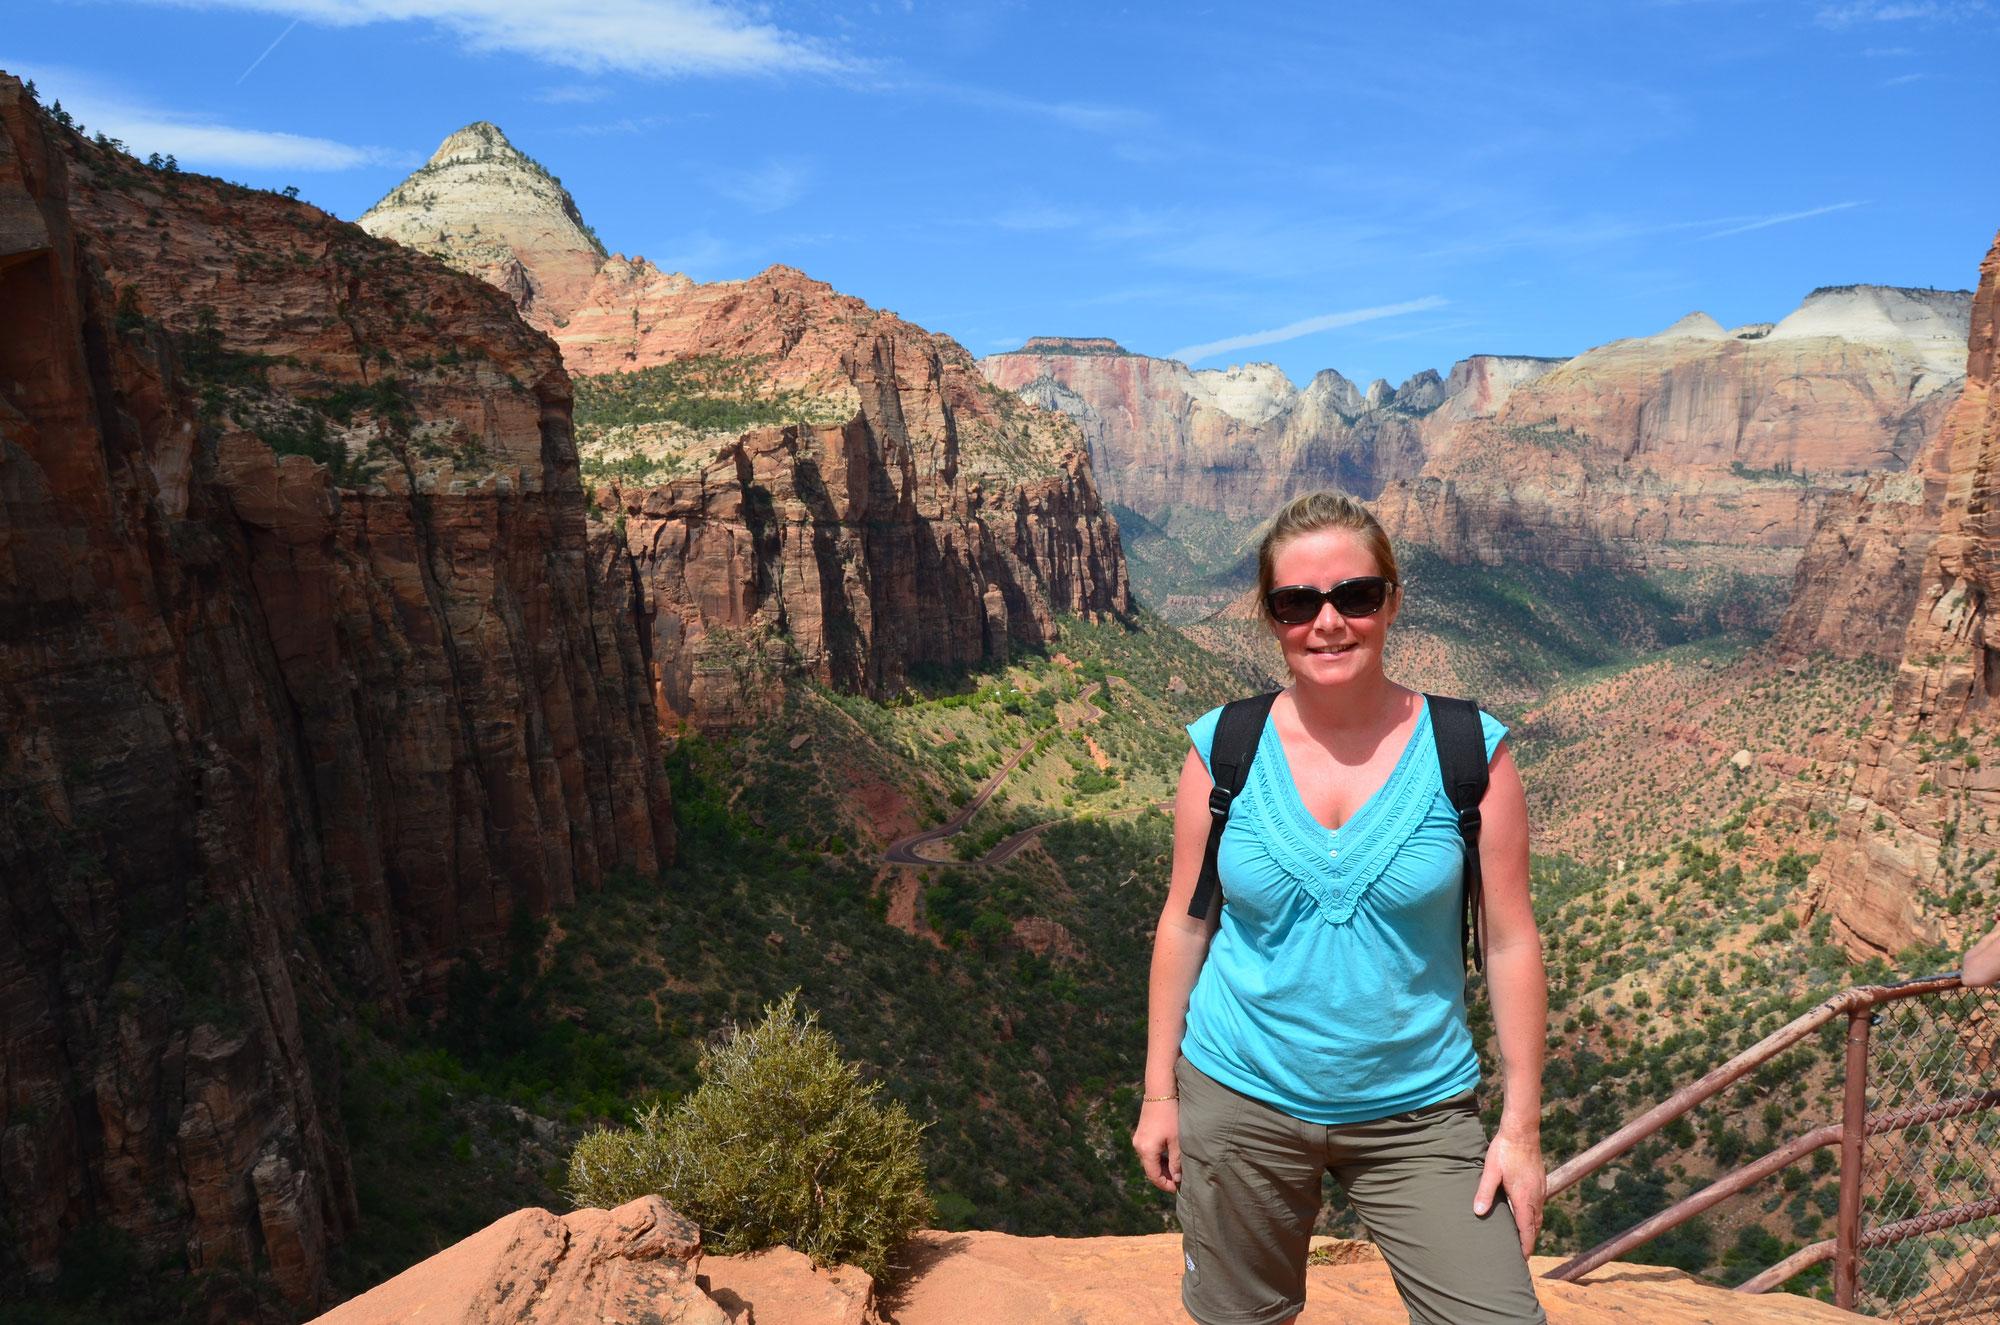 ROAD TRIP USA - Zion National Park